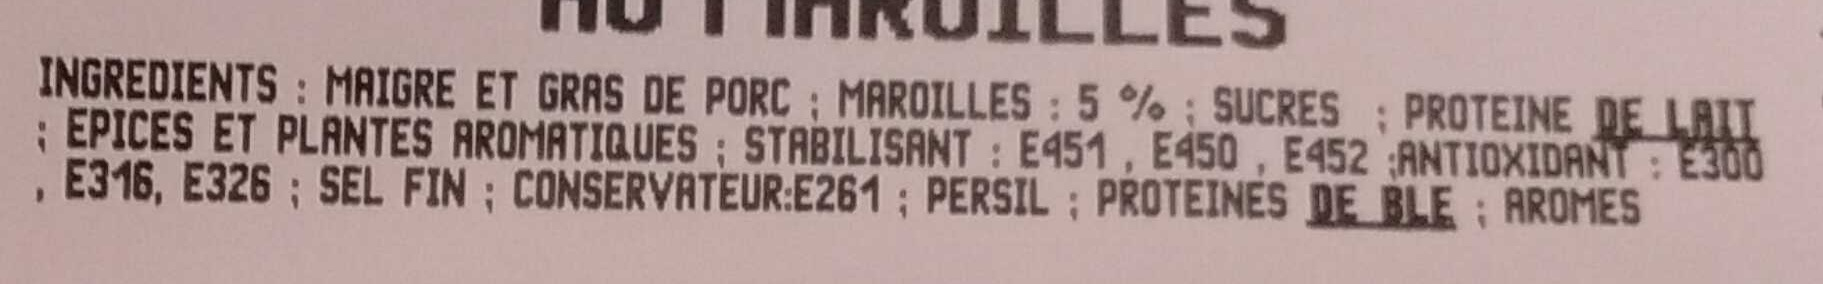 Saucisses au Maroille - Ingrediënten - fr